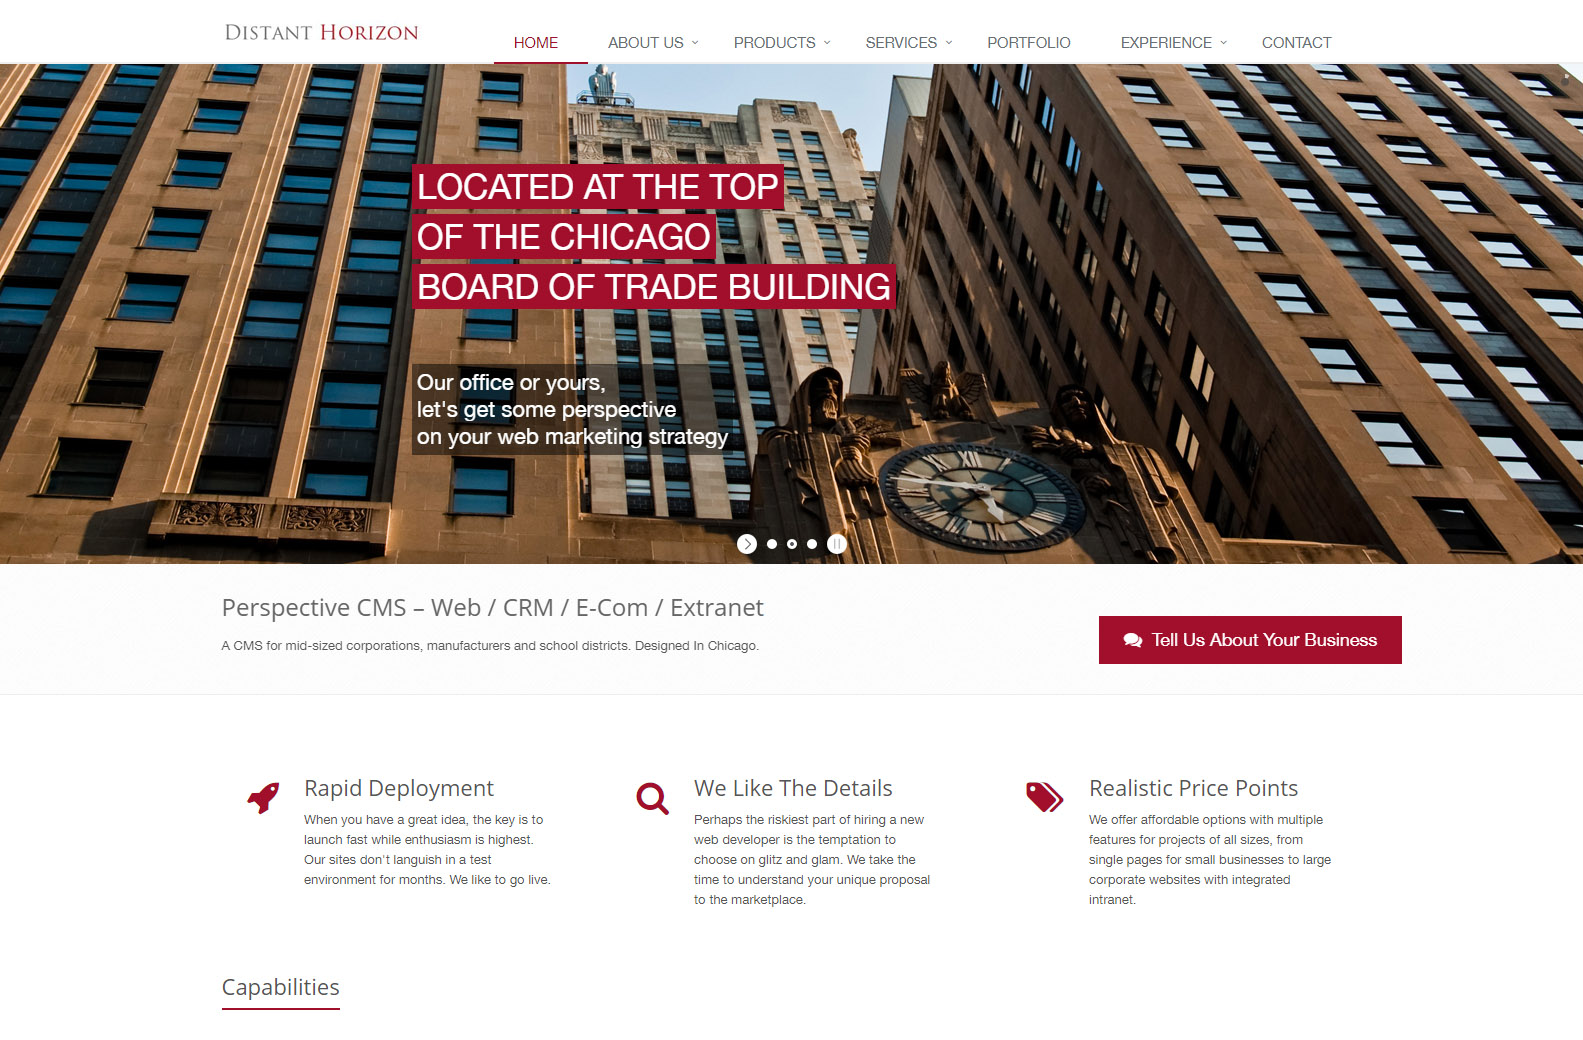 Distant Horizon - Web Agencies in Chicago